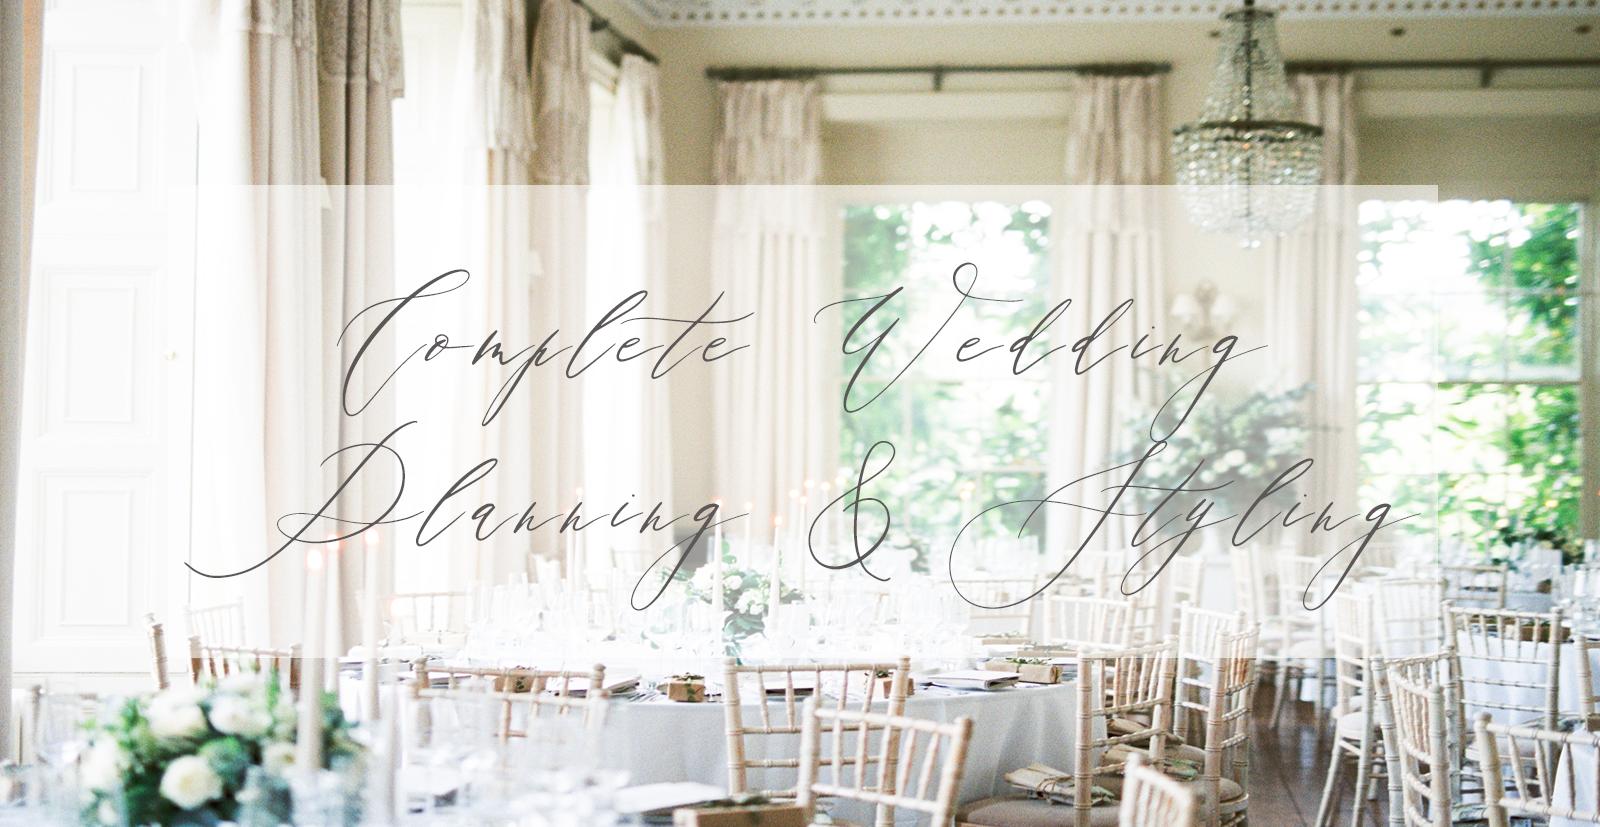 Luxury Wedding Planner | Complete Wedding Planning | Pynes House Wedding Devon Wedding Green Foliage White Flowers White Wedding English Wedding Country House Wedding | Andrew & Ada Photography.png